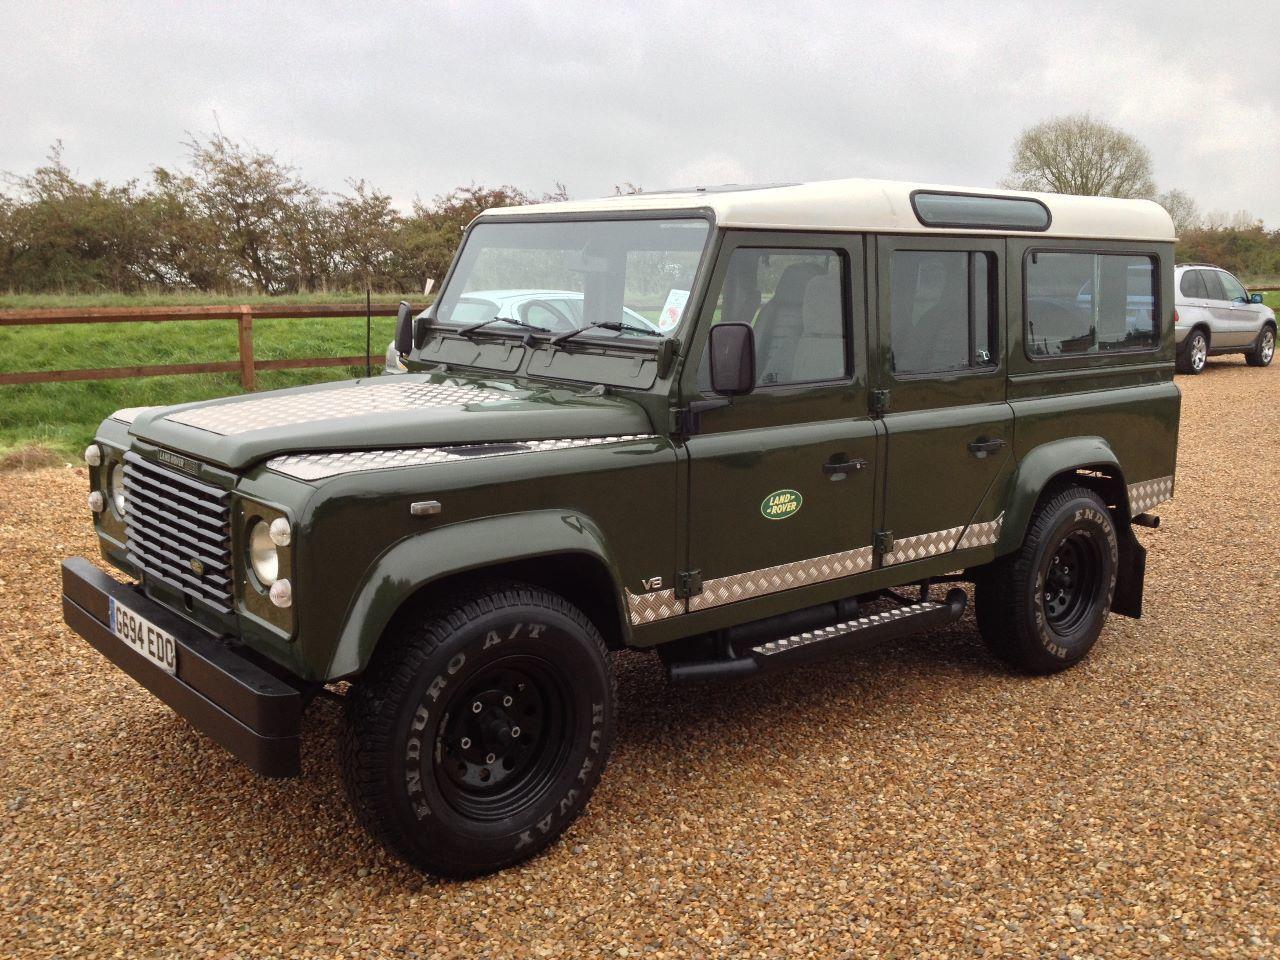 Used Land Rover Defender 110 35 V8 County Station Wagon